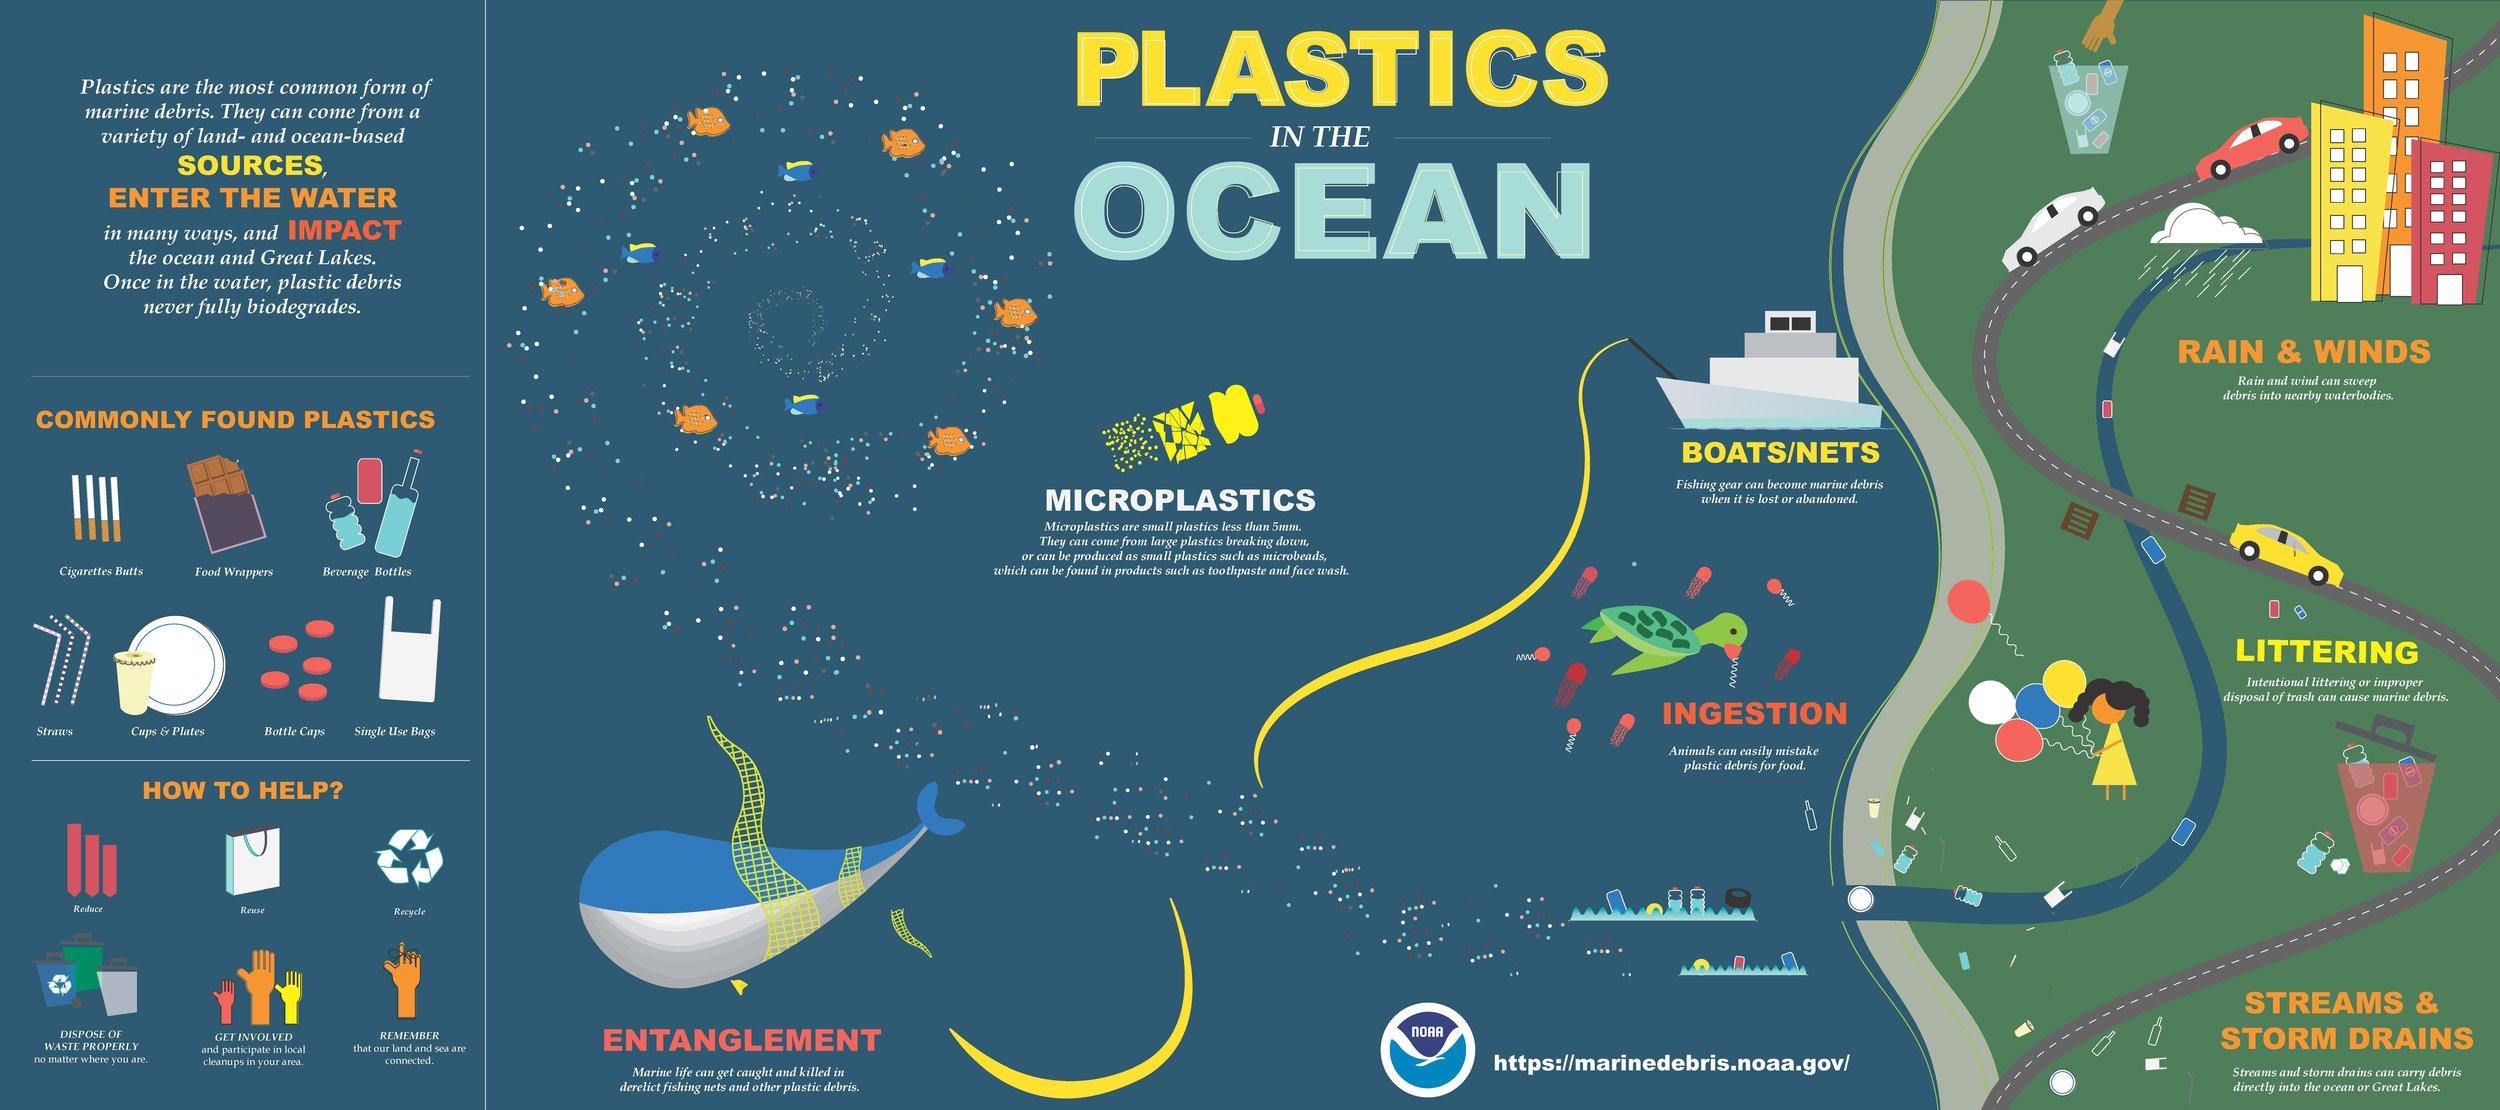 © NOAA Marine Debris